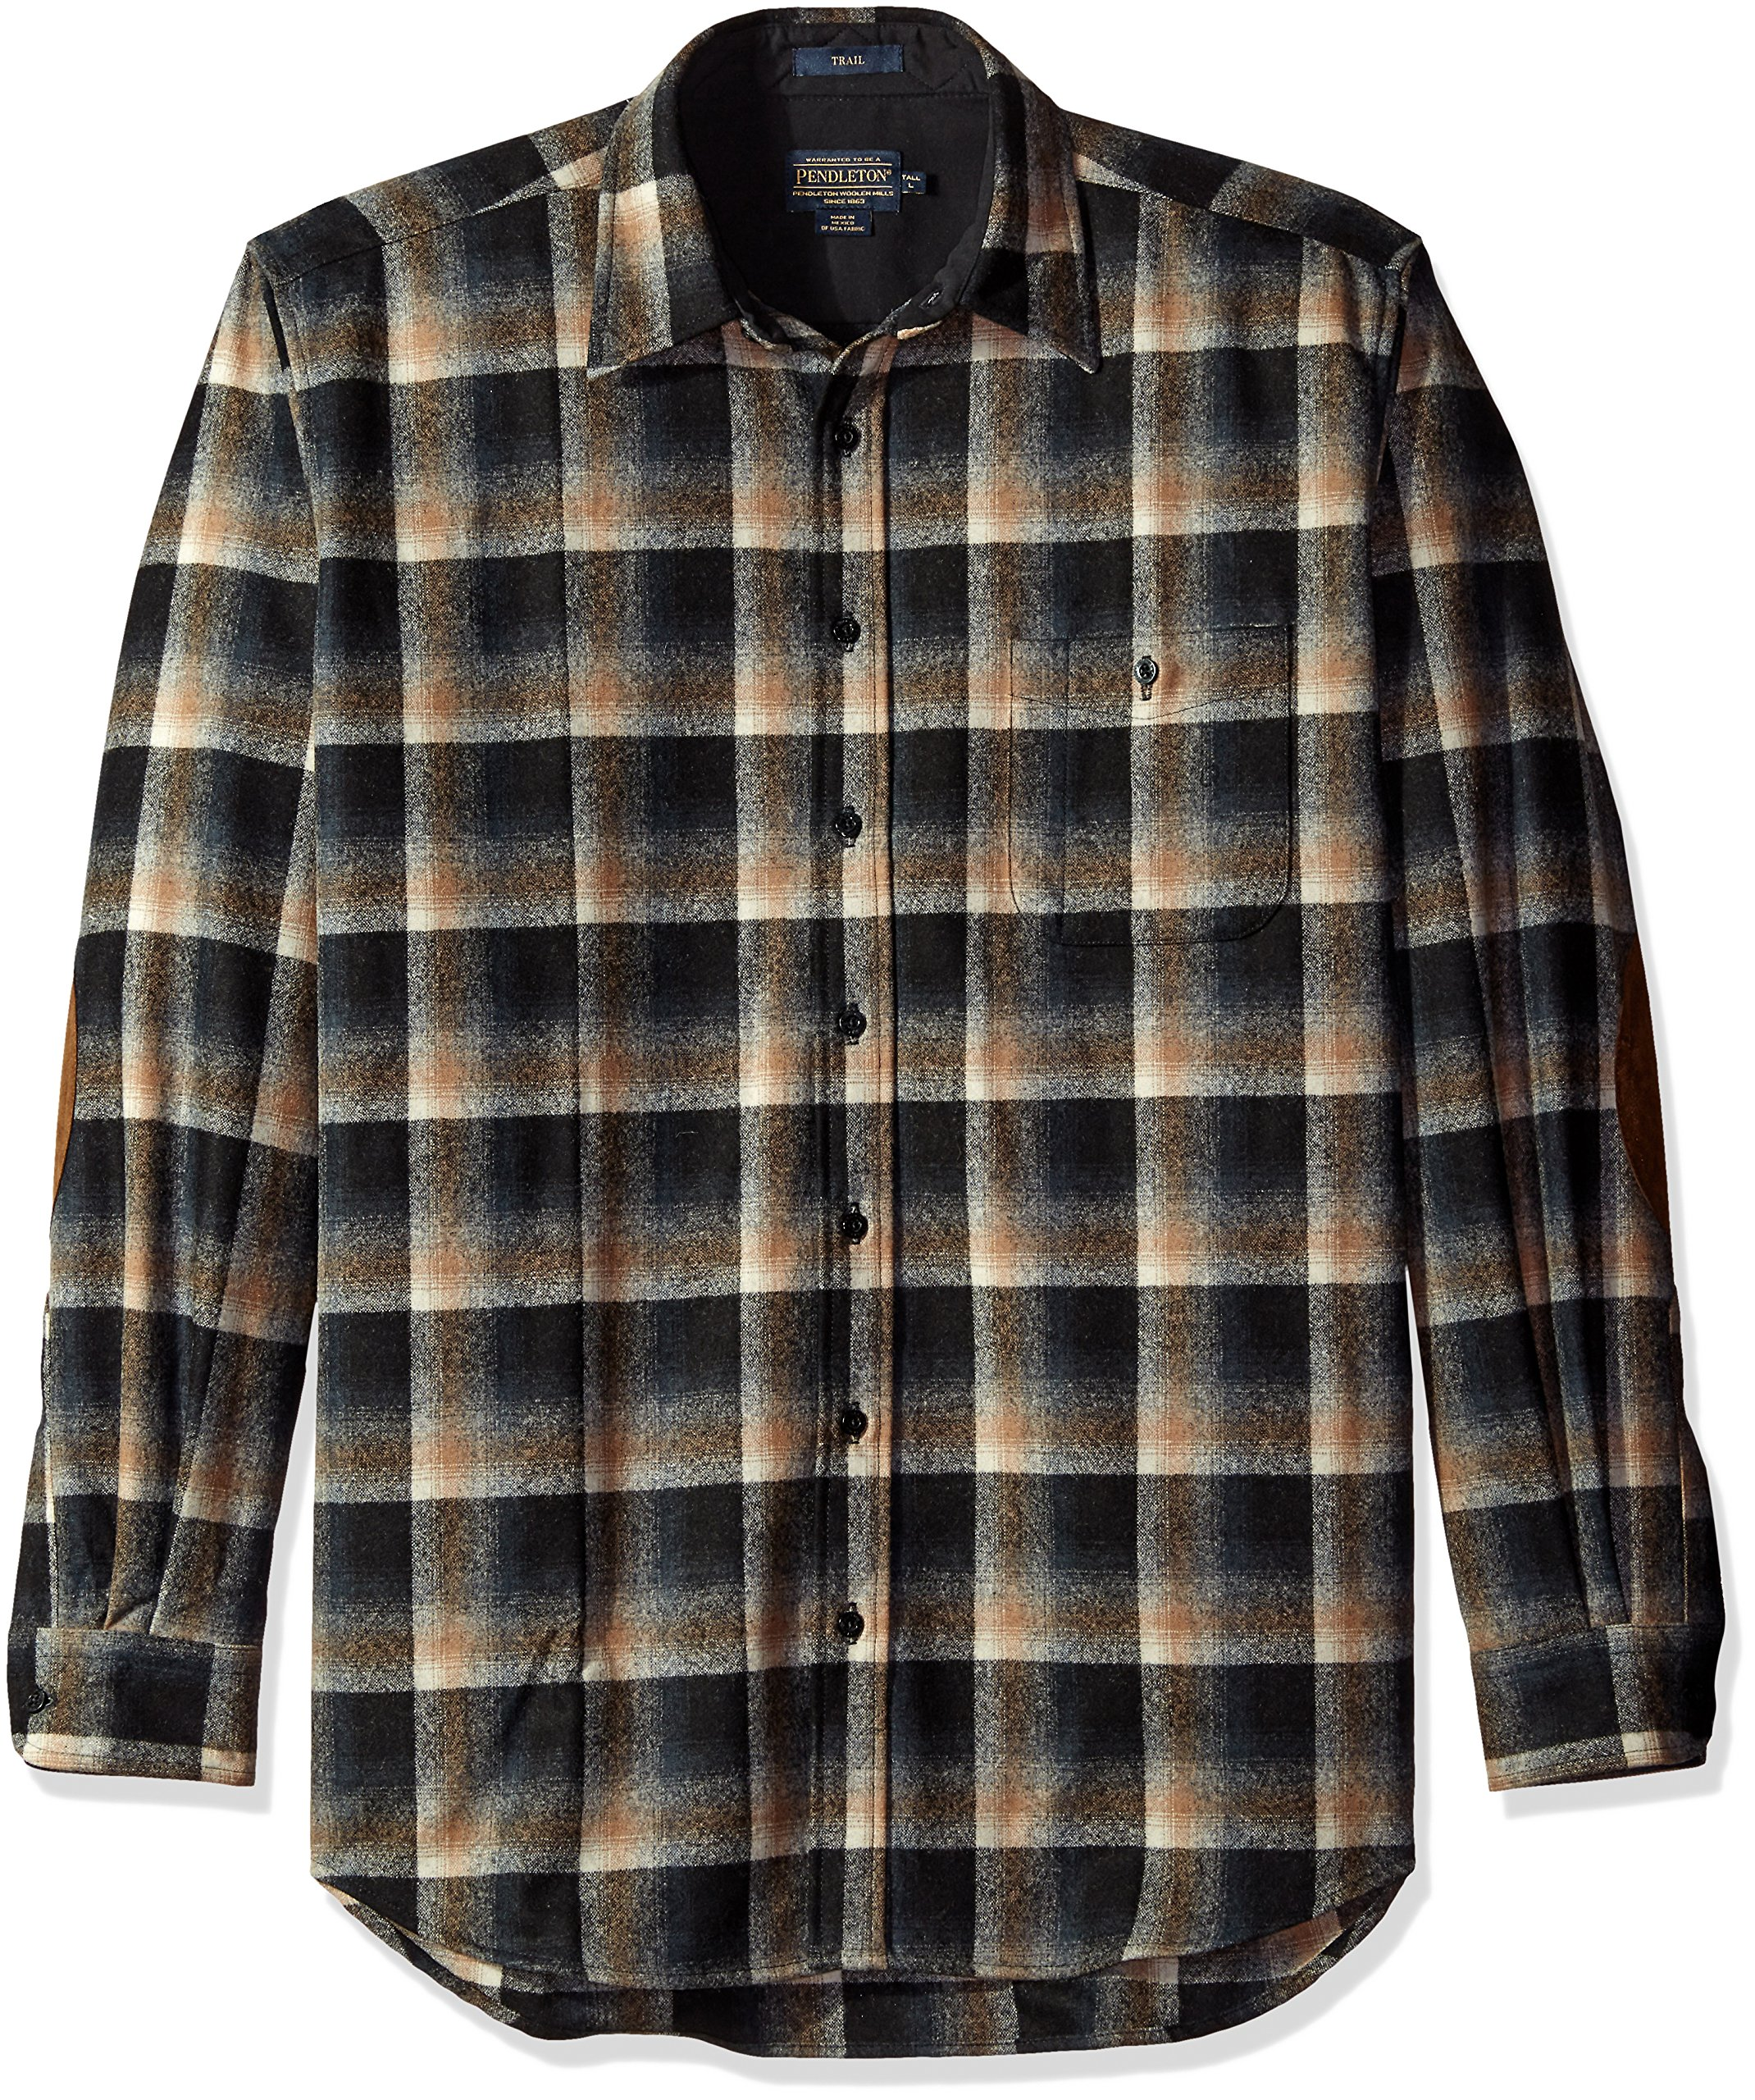 Pendleton Men's Big and Tall Long Sleeve Trail Shirt, Black/Brown Ombre-31859, LG